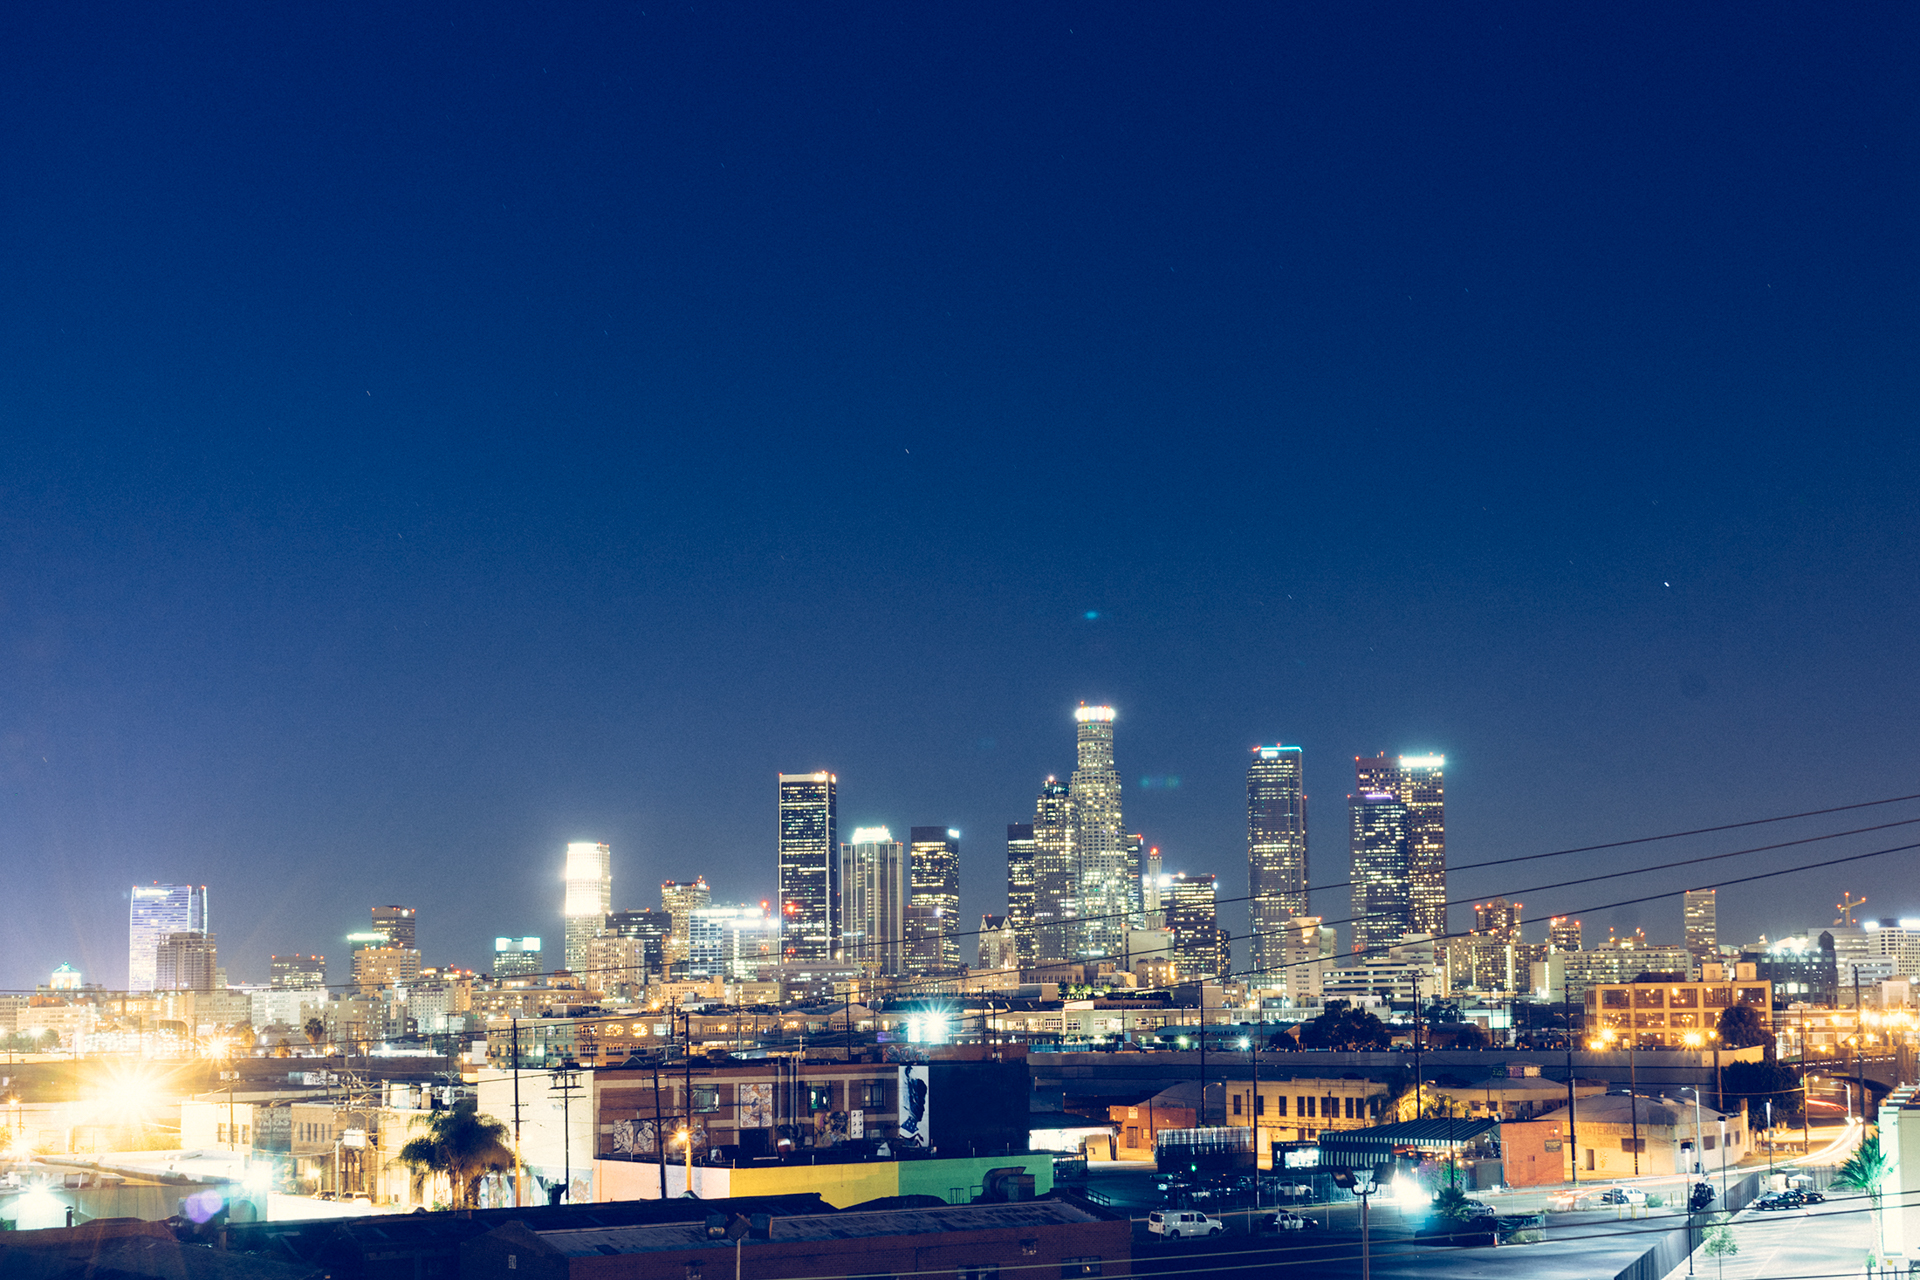 free stock photo of city hd wallpaper night